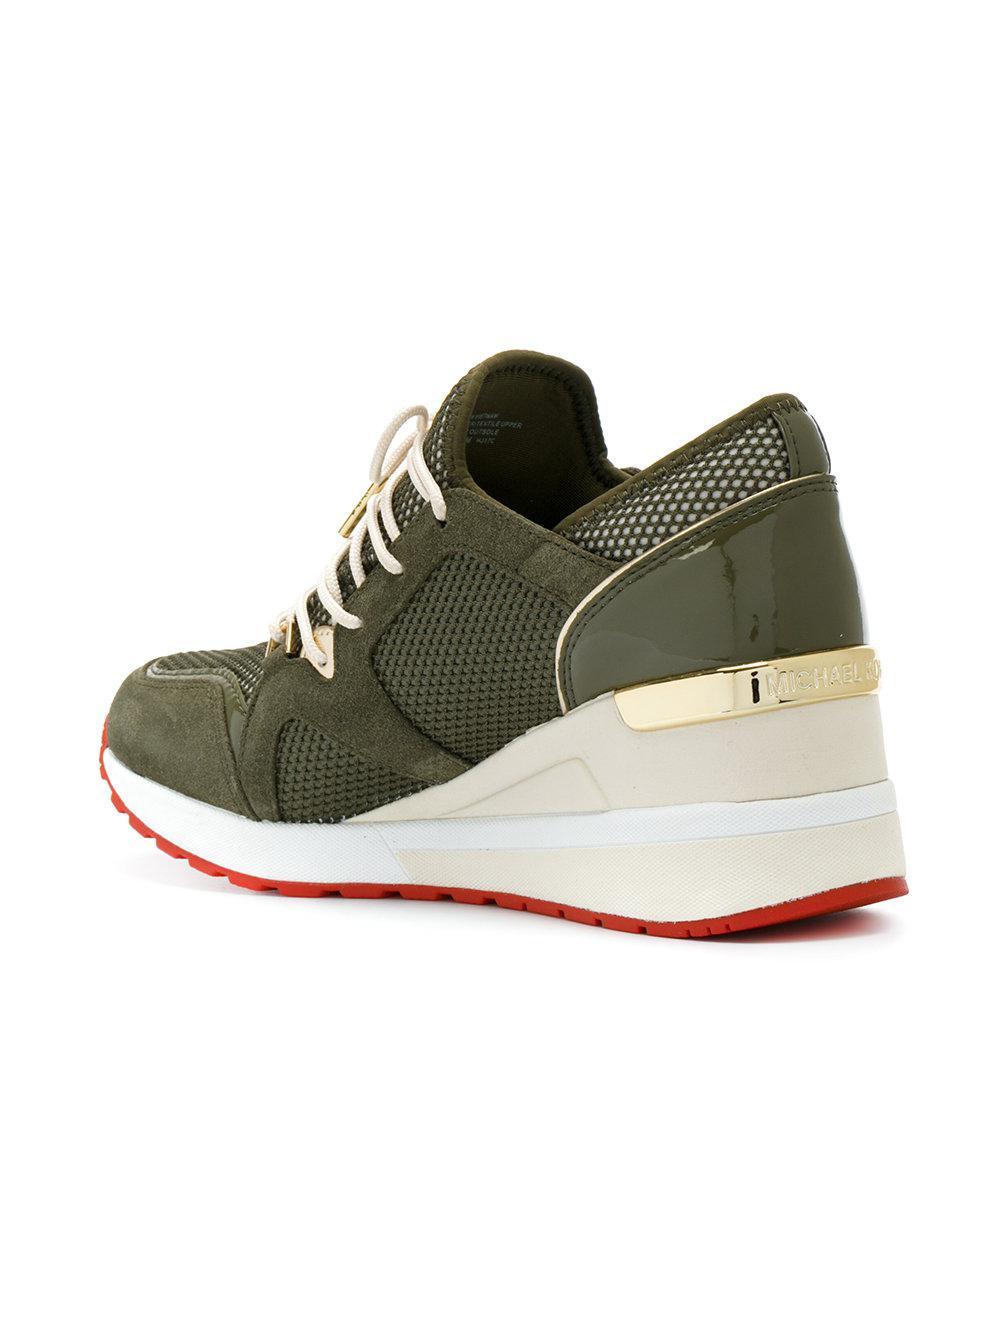 Michael Kors Tennis Shoes White